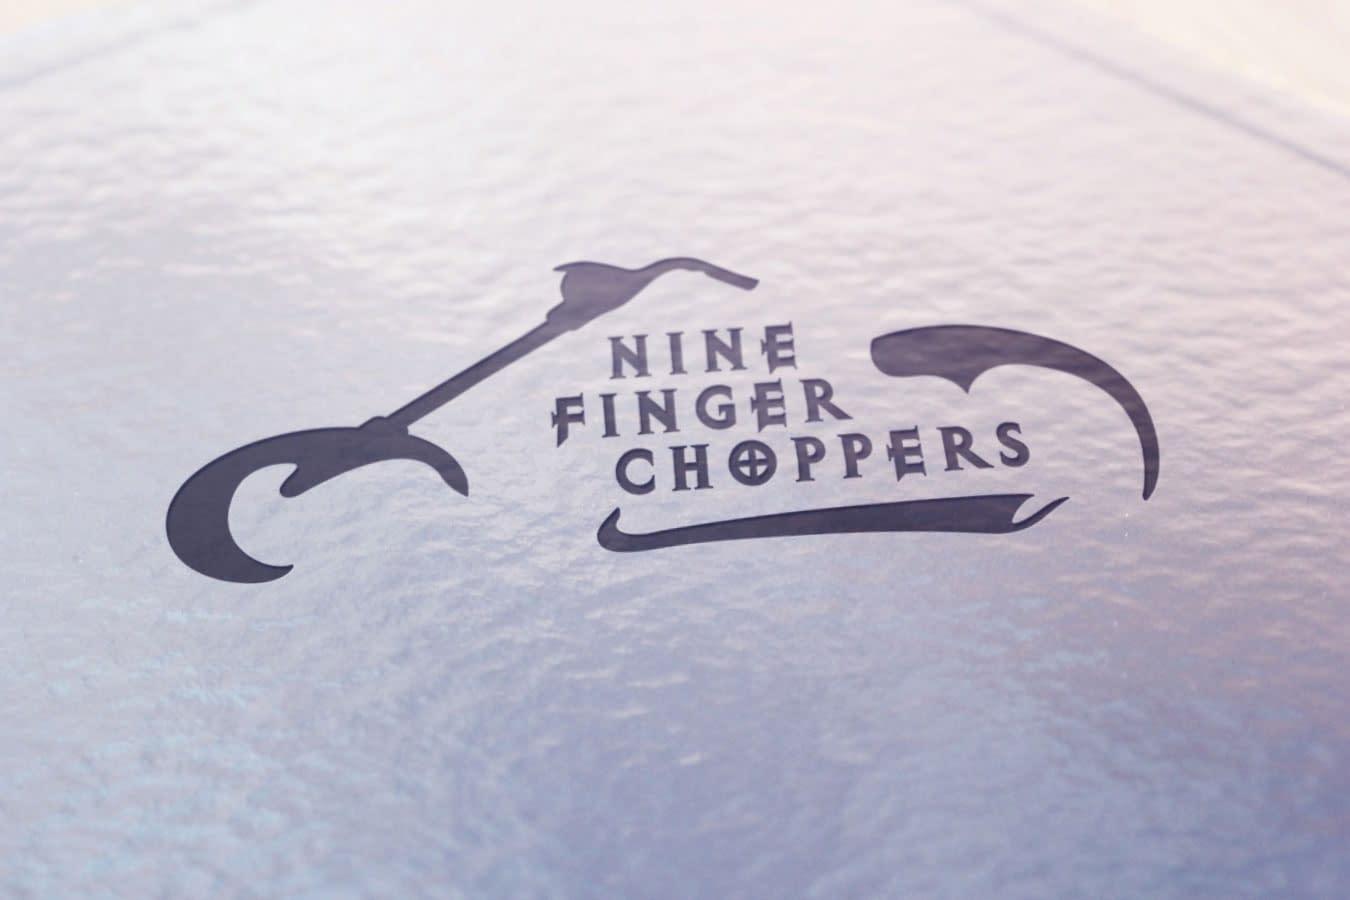 Logos_ninechoppers_glossy